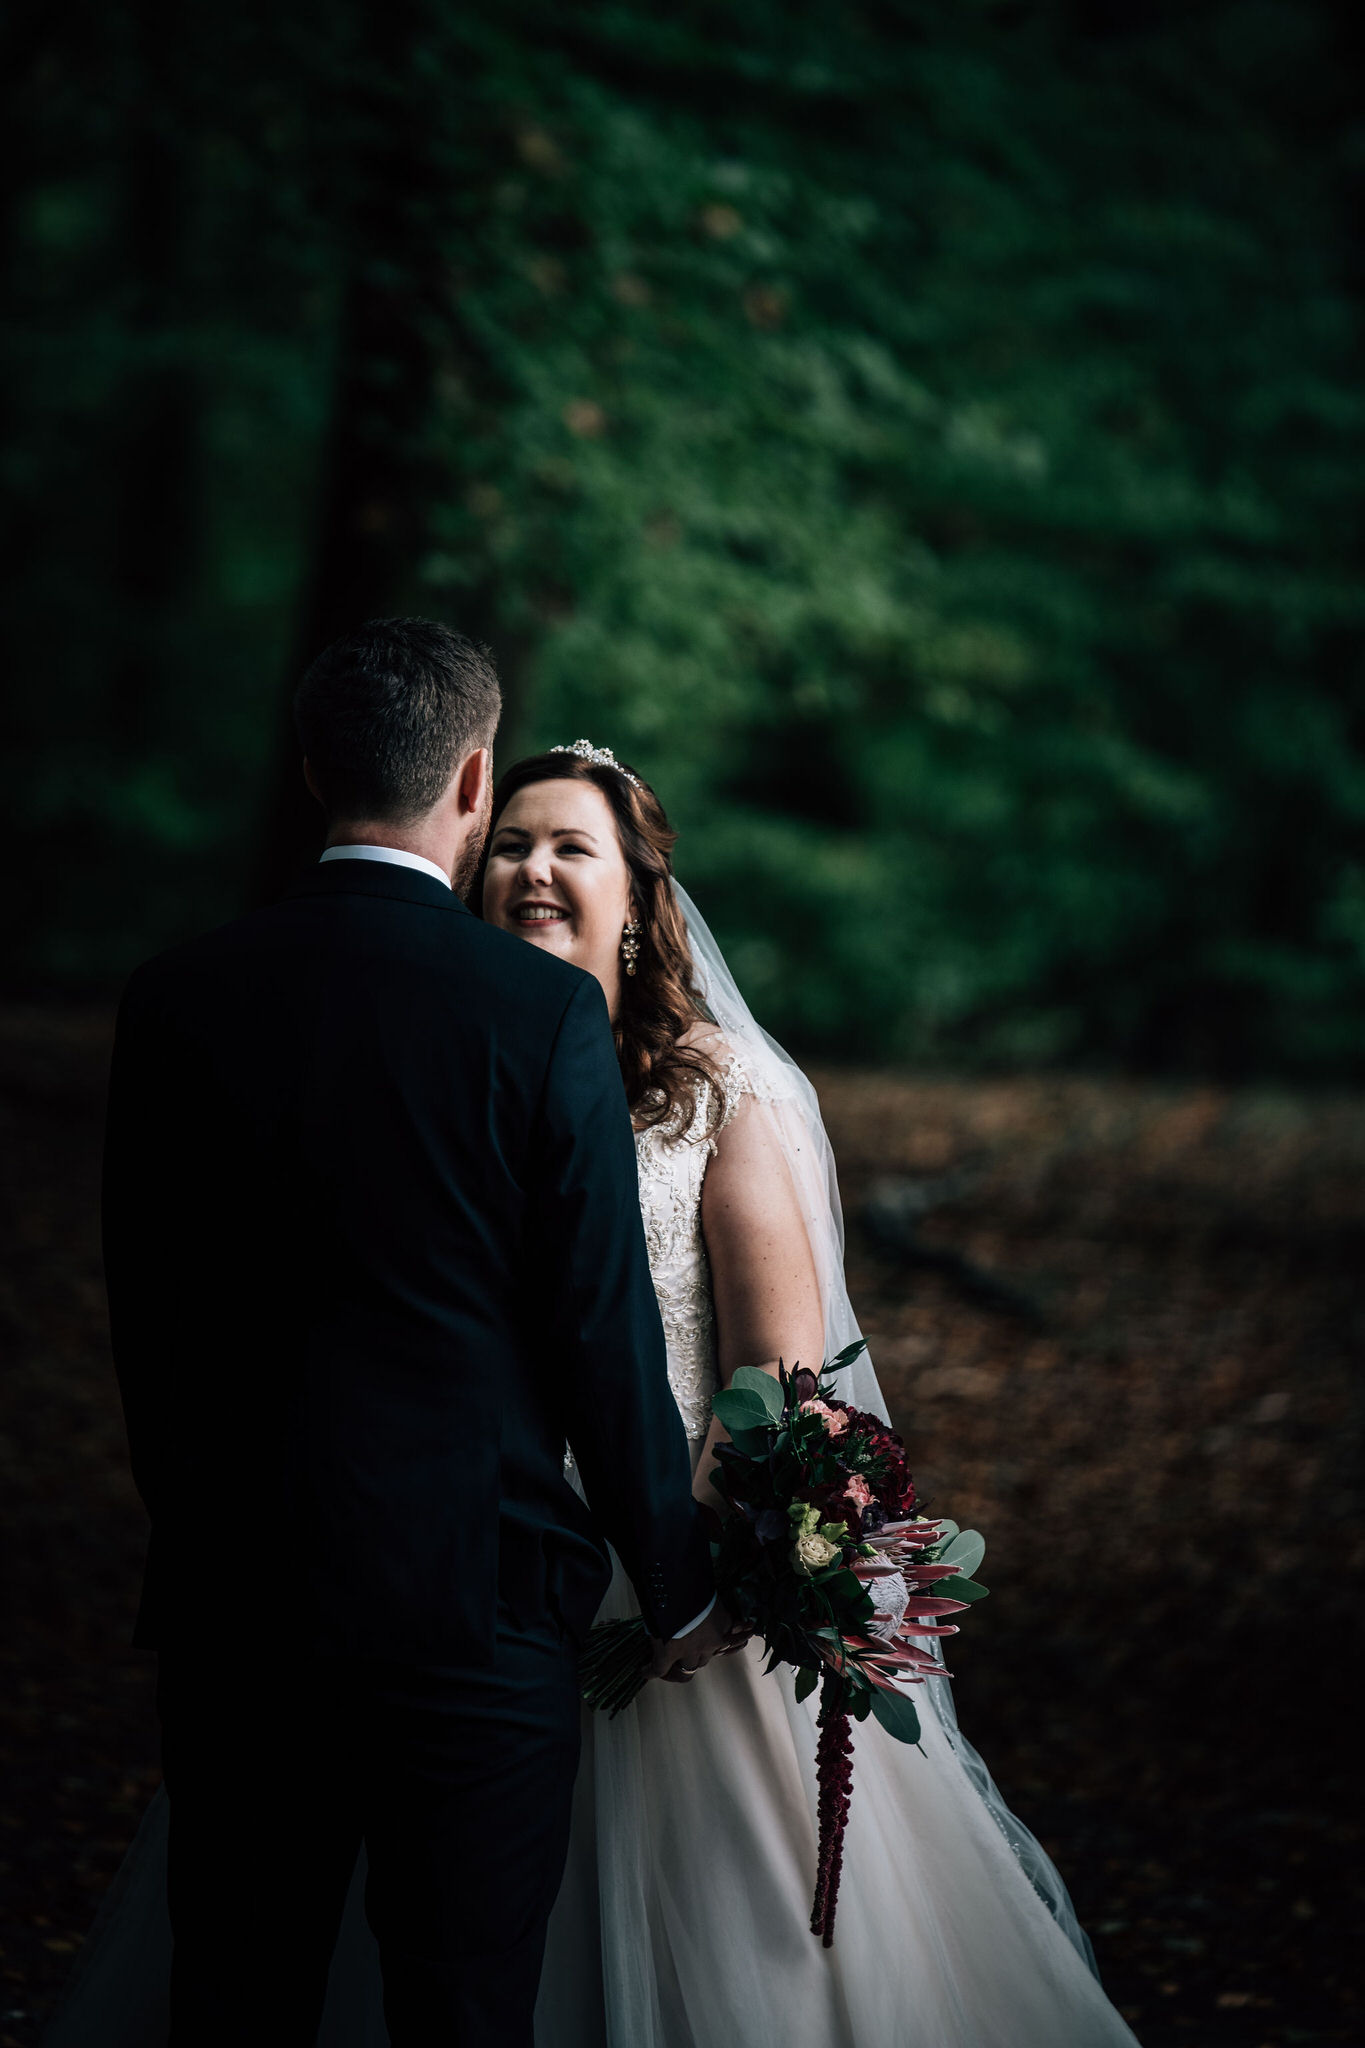 _N857897_fotografering_larvik_bryllup_aspargesgarden_.jpg